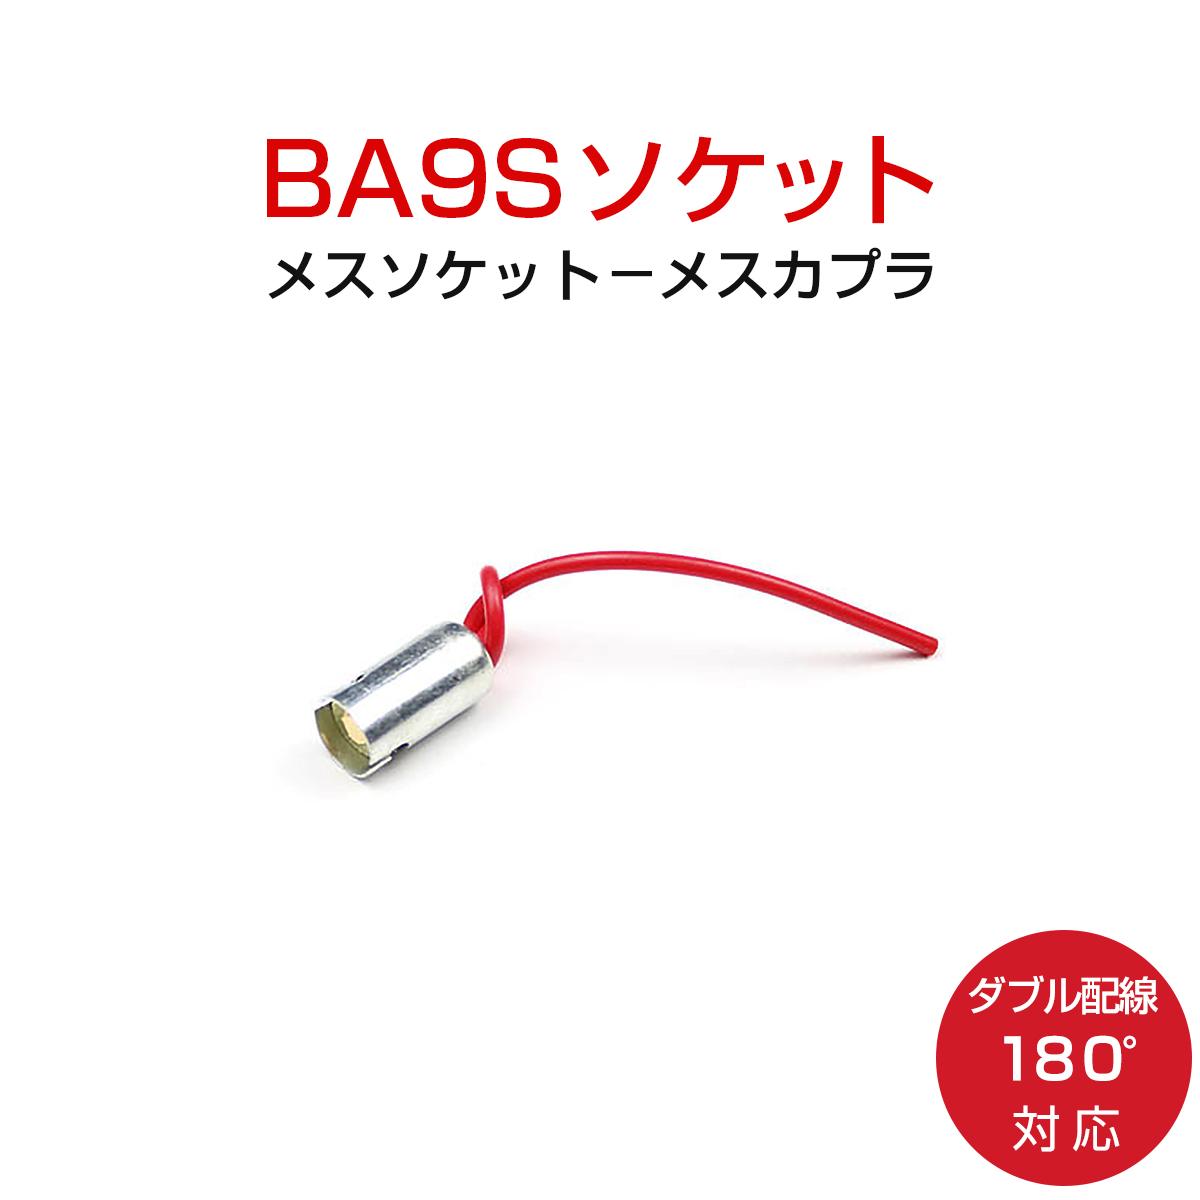 BA9S 180度対応 ソケット 2個セット ダブル配線 メスソケット メスカプラ 台座 汎用ソケット 色々使える 電装系 SDM便送料無料 1ヶ月保証 K&M